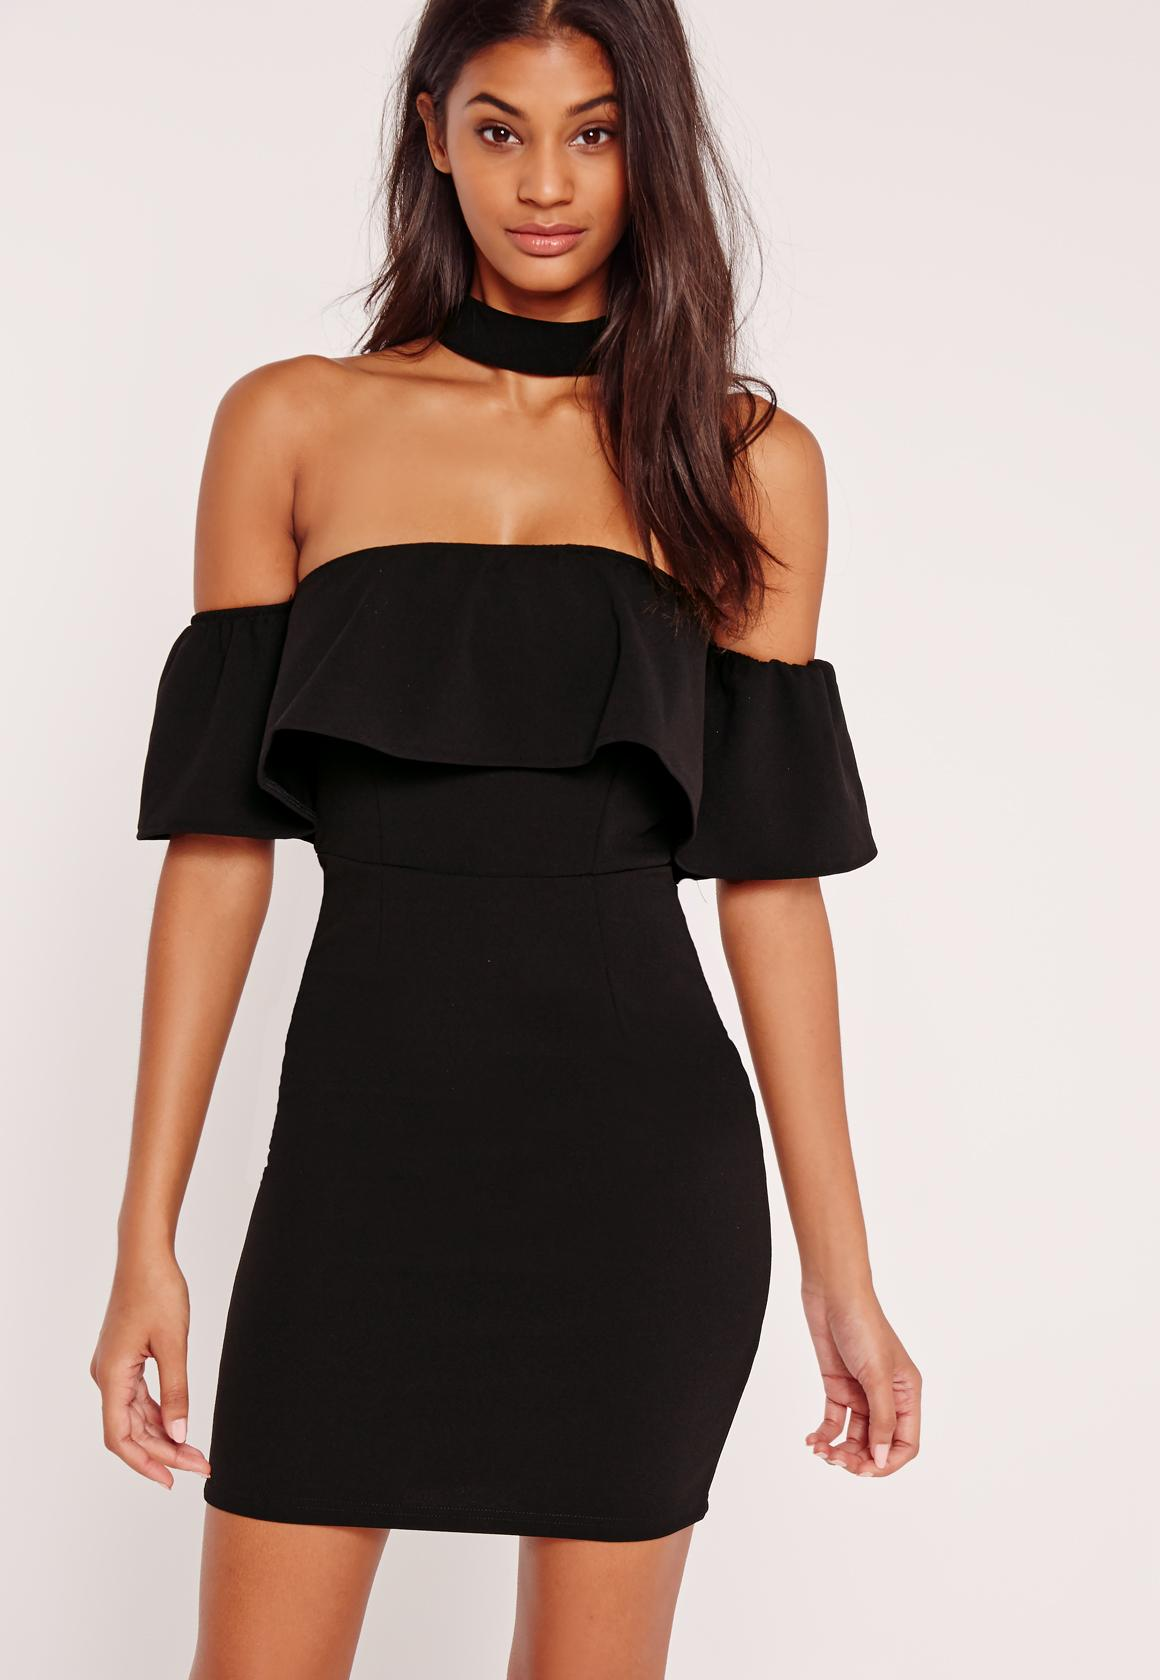 Choker Neck Bardot Frill Dress Black